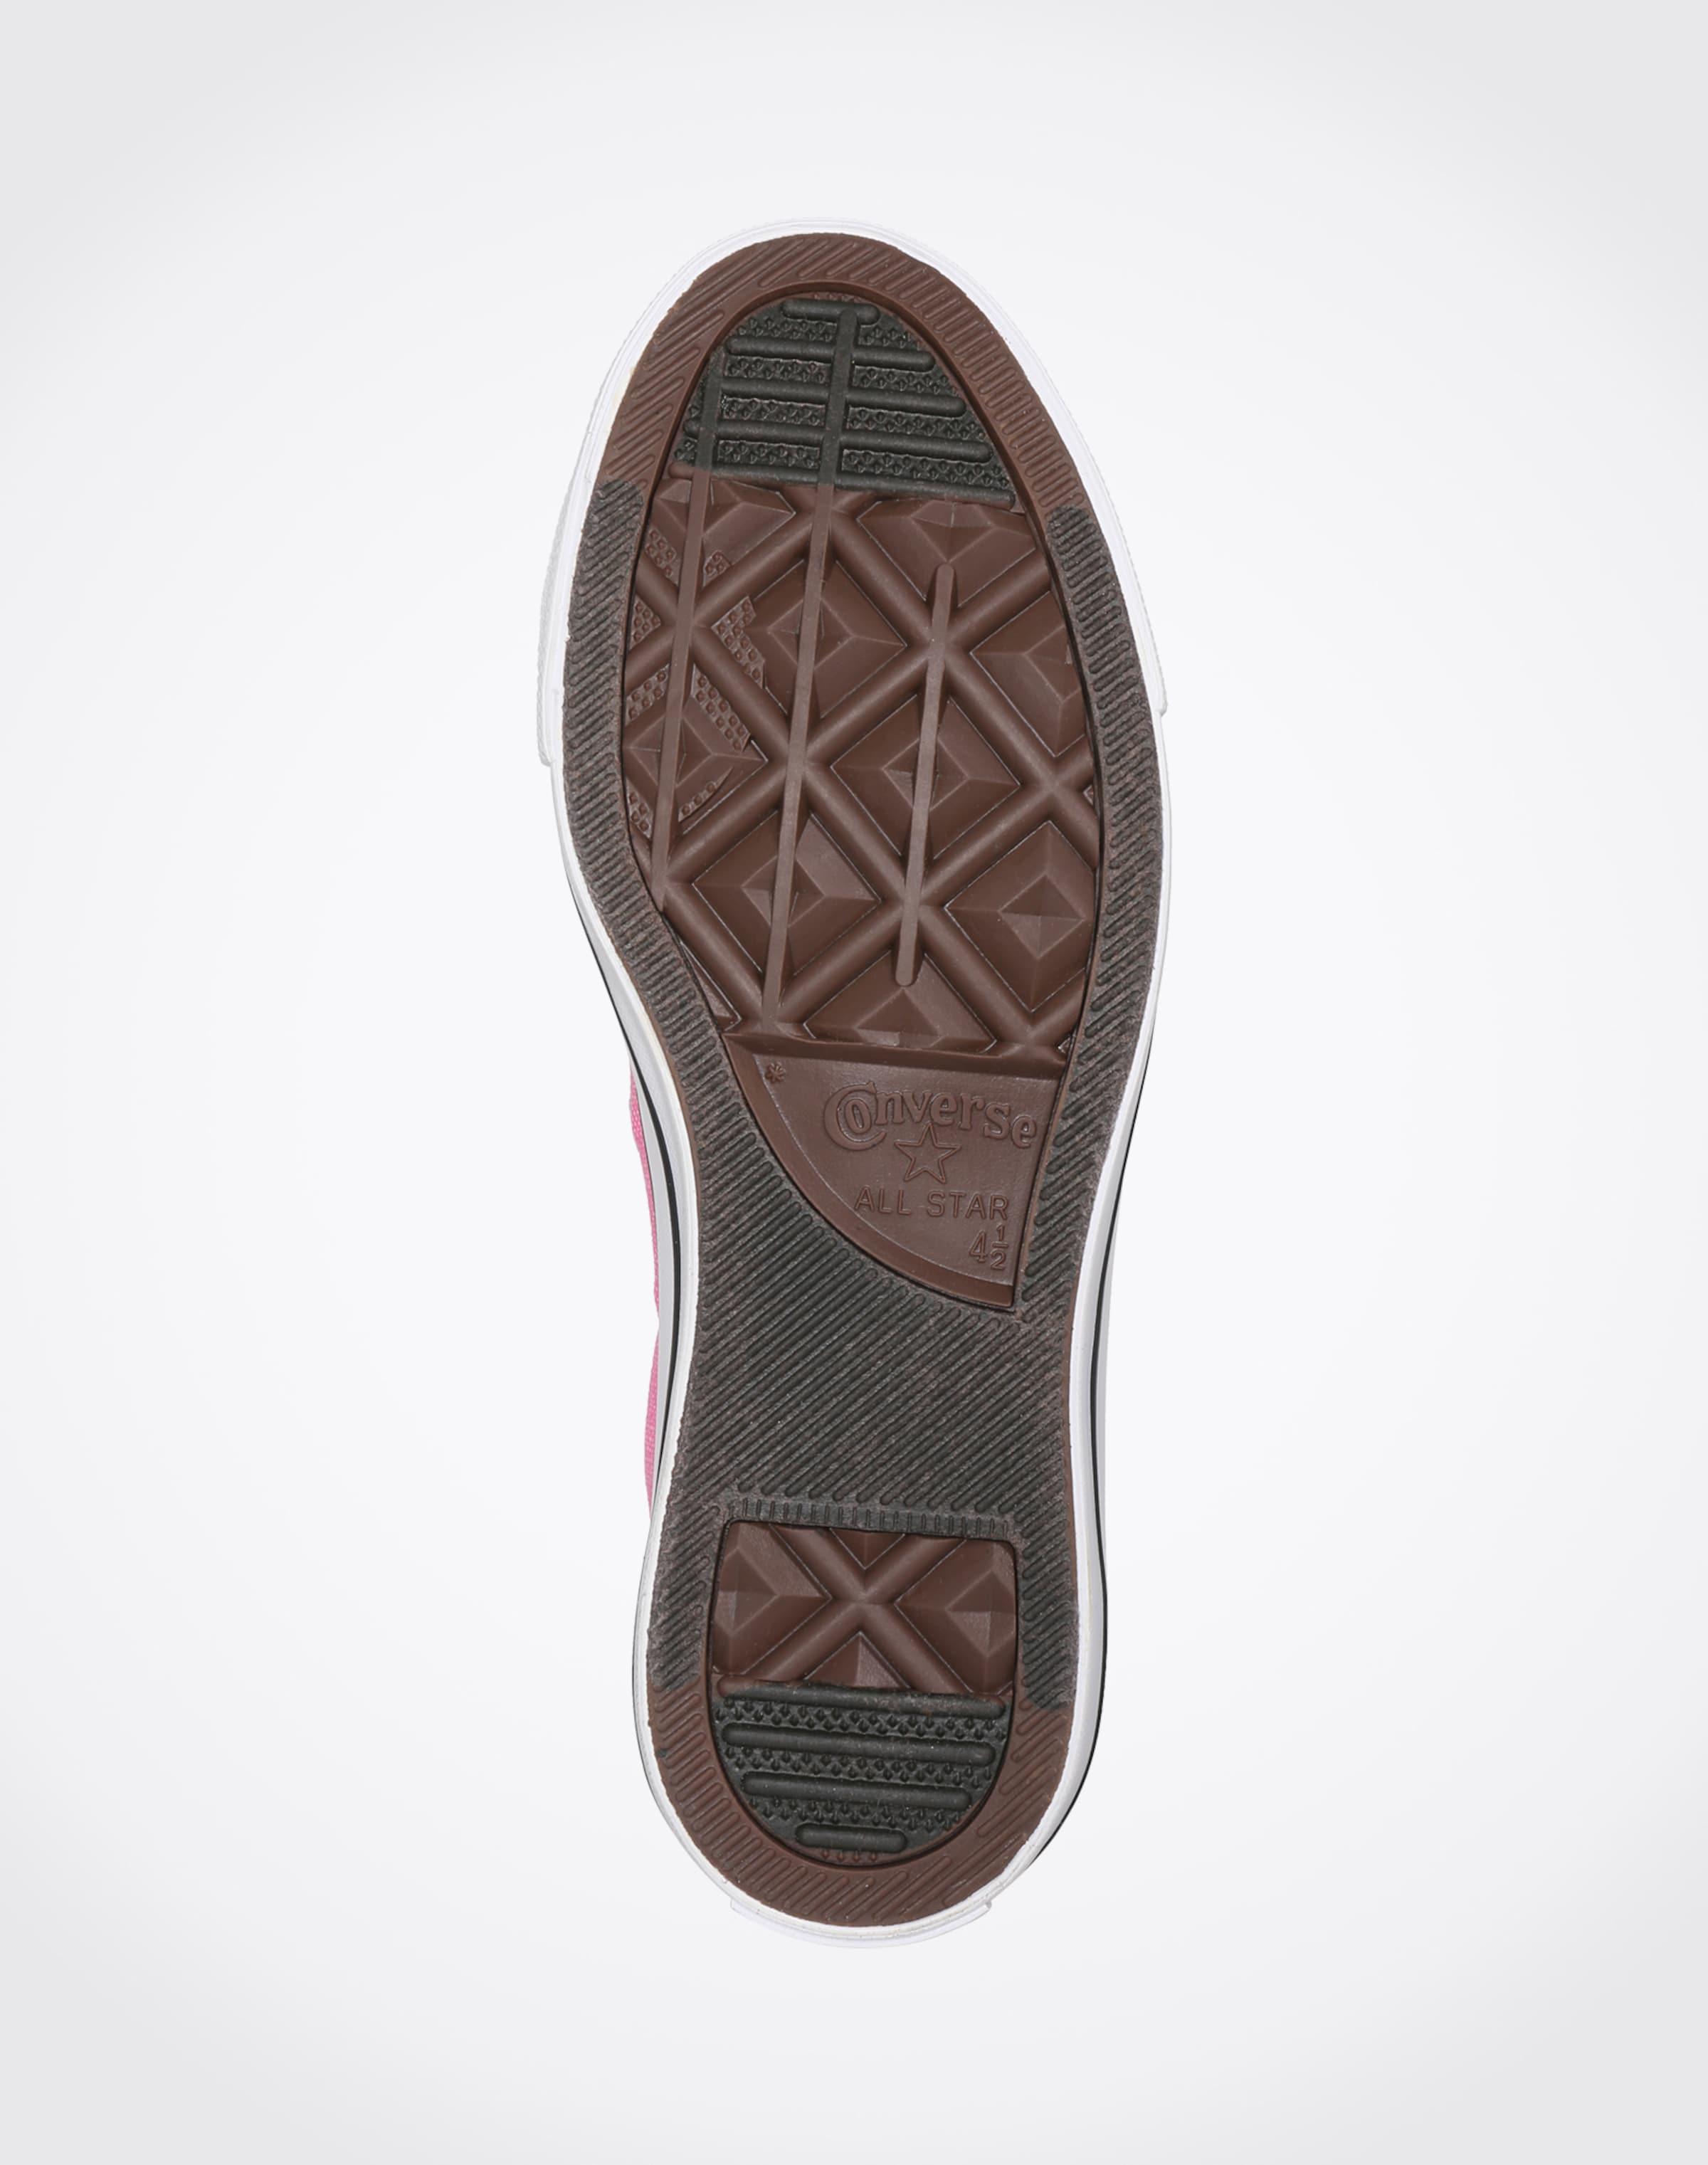 CONVERSE Chuck Taylor All Star hi Sneakers Billig Neueste XgGYlYA